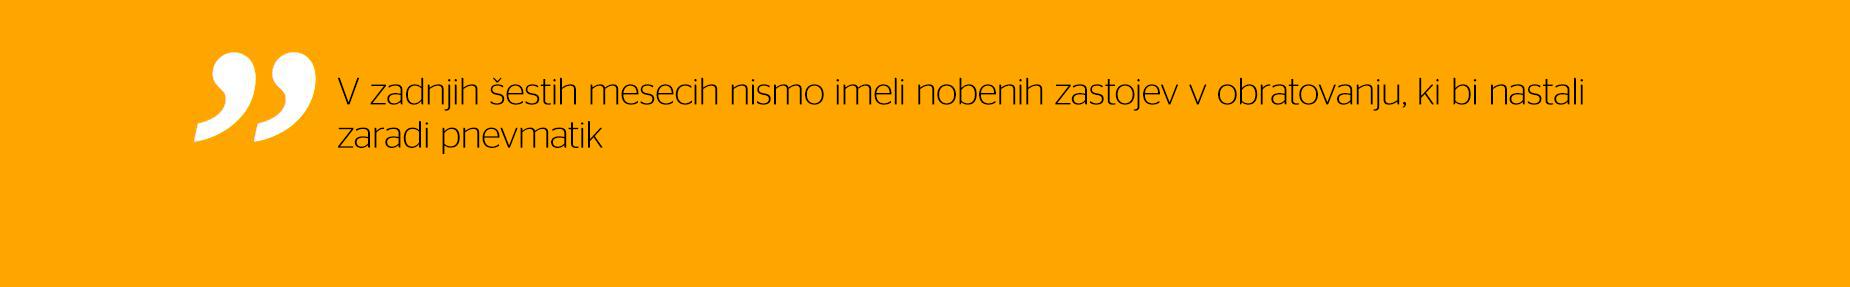 slovenia-eurotek-quote